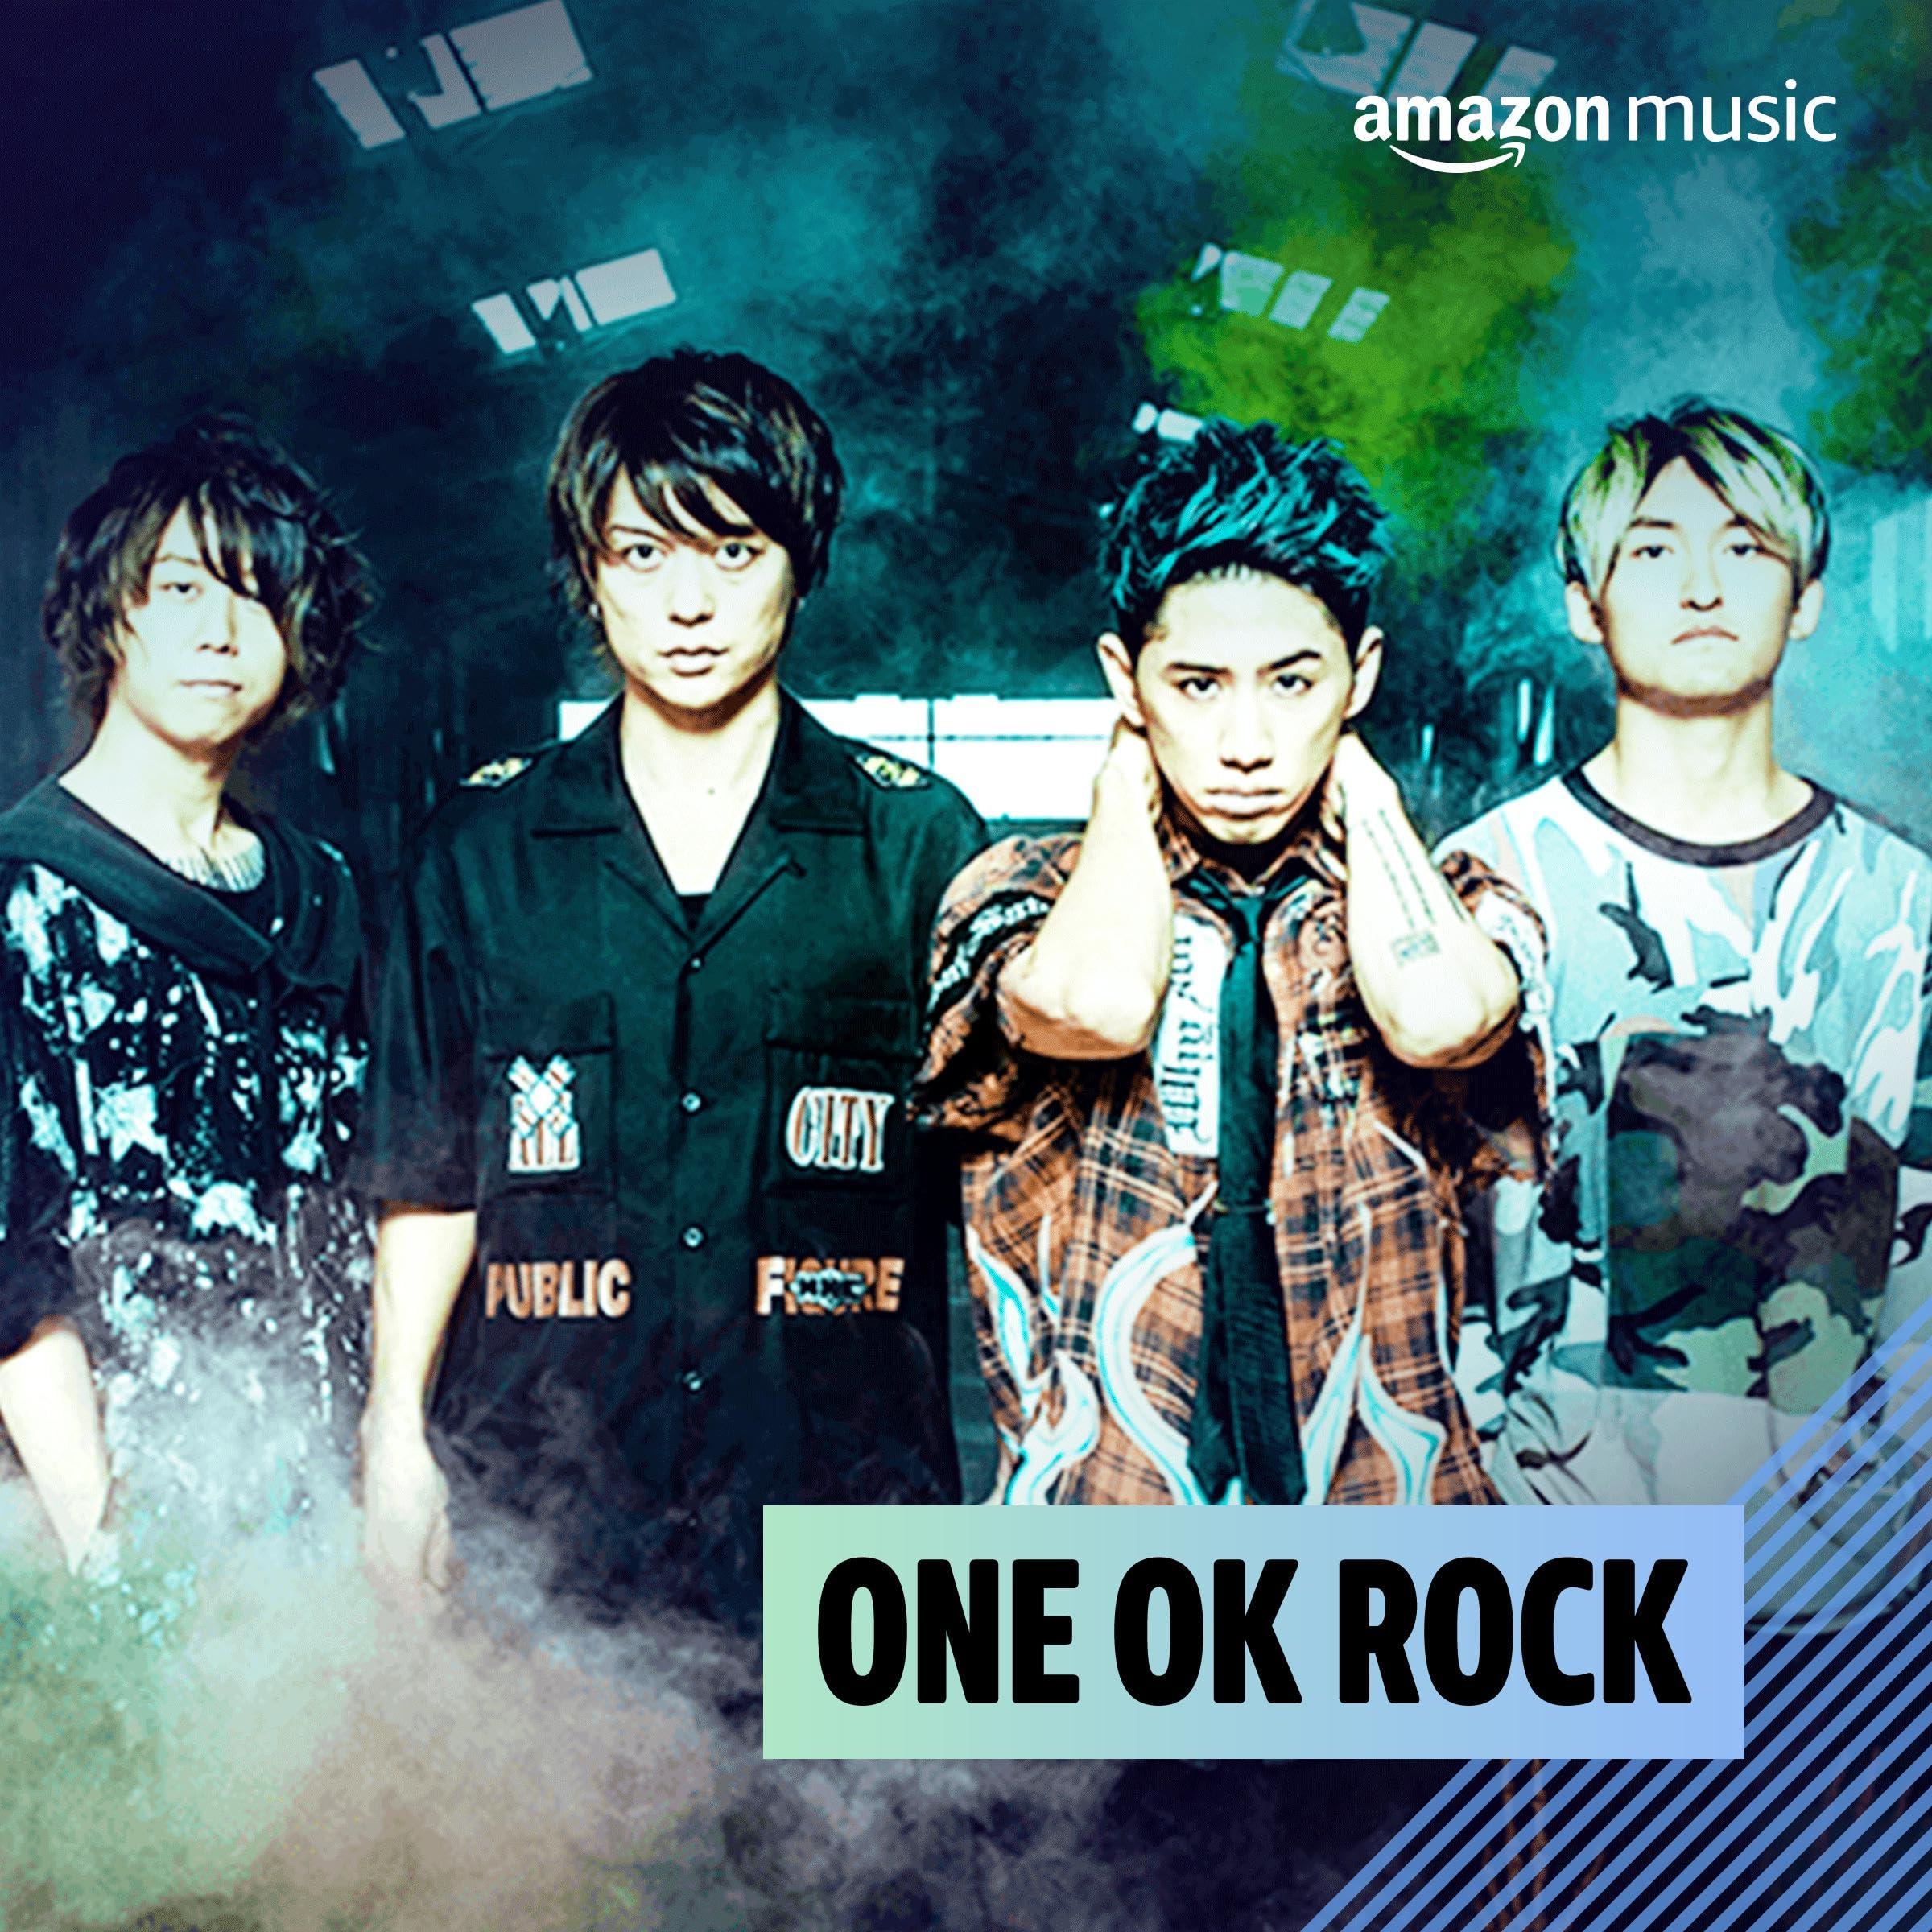 ONE OK ROCKを聴いているお客様におすすめ